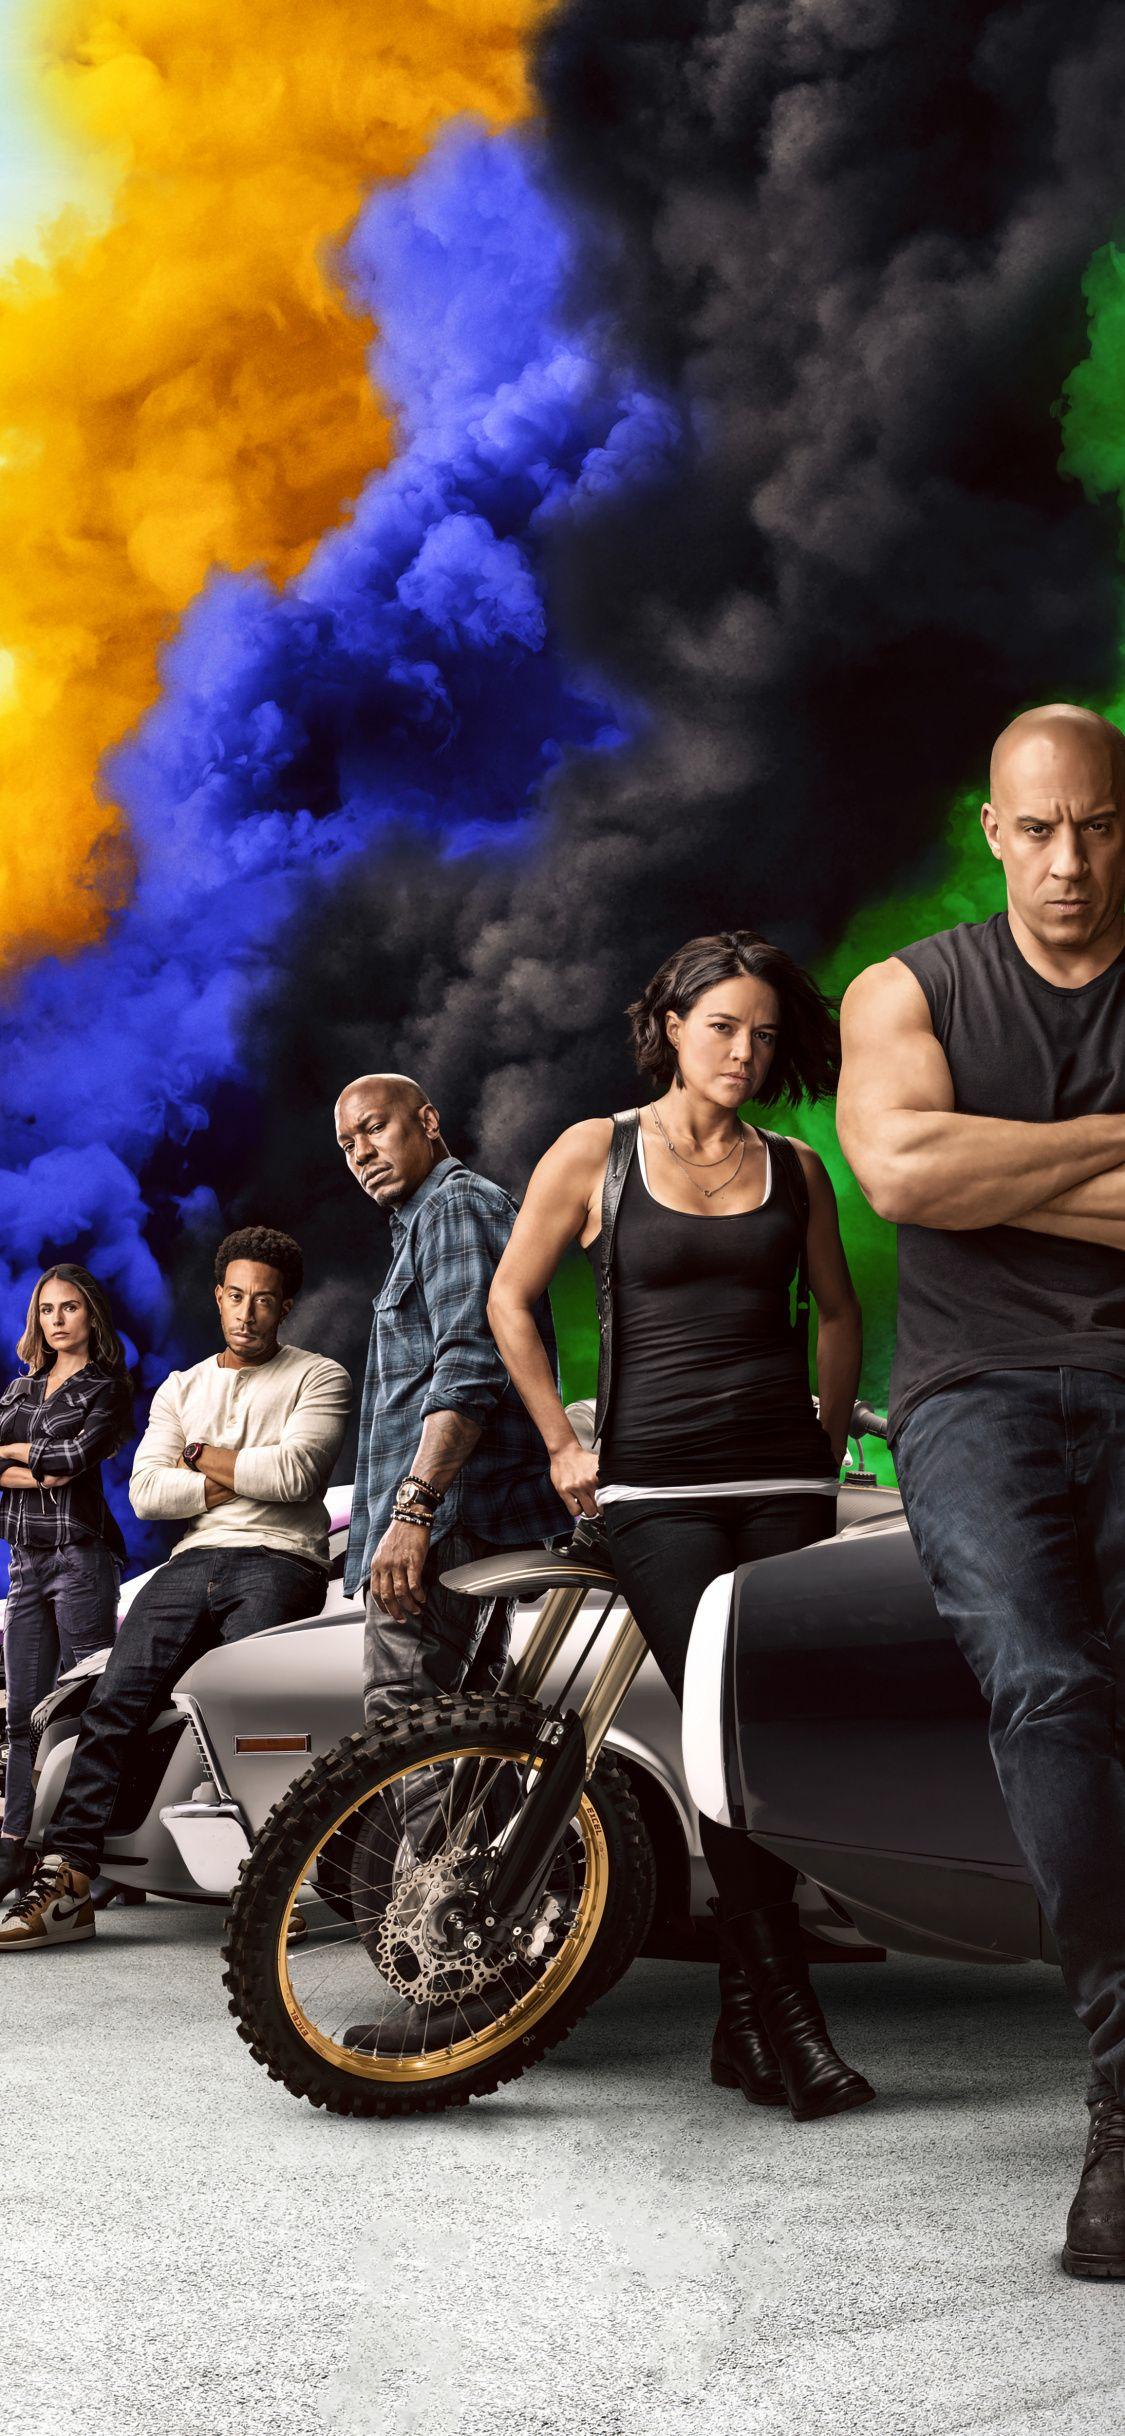 1125x2436 Movie 2020 cast Fast Furious 9 wallpaper in 2020 1125x2436